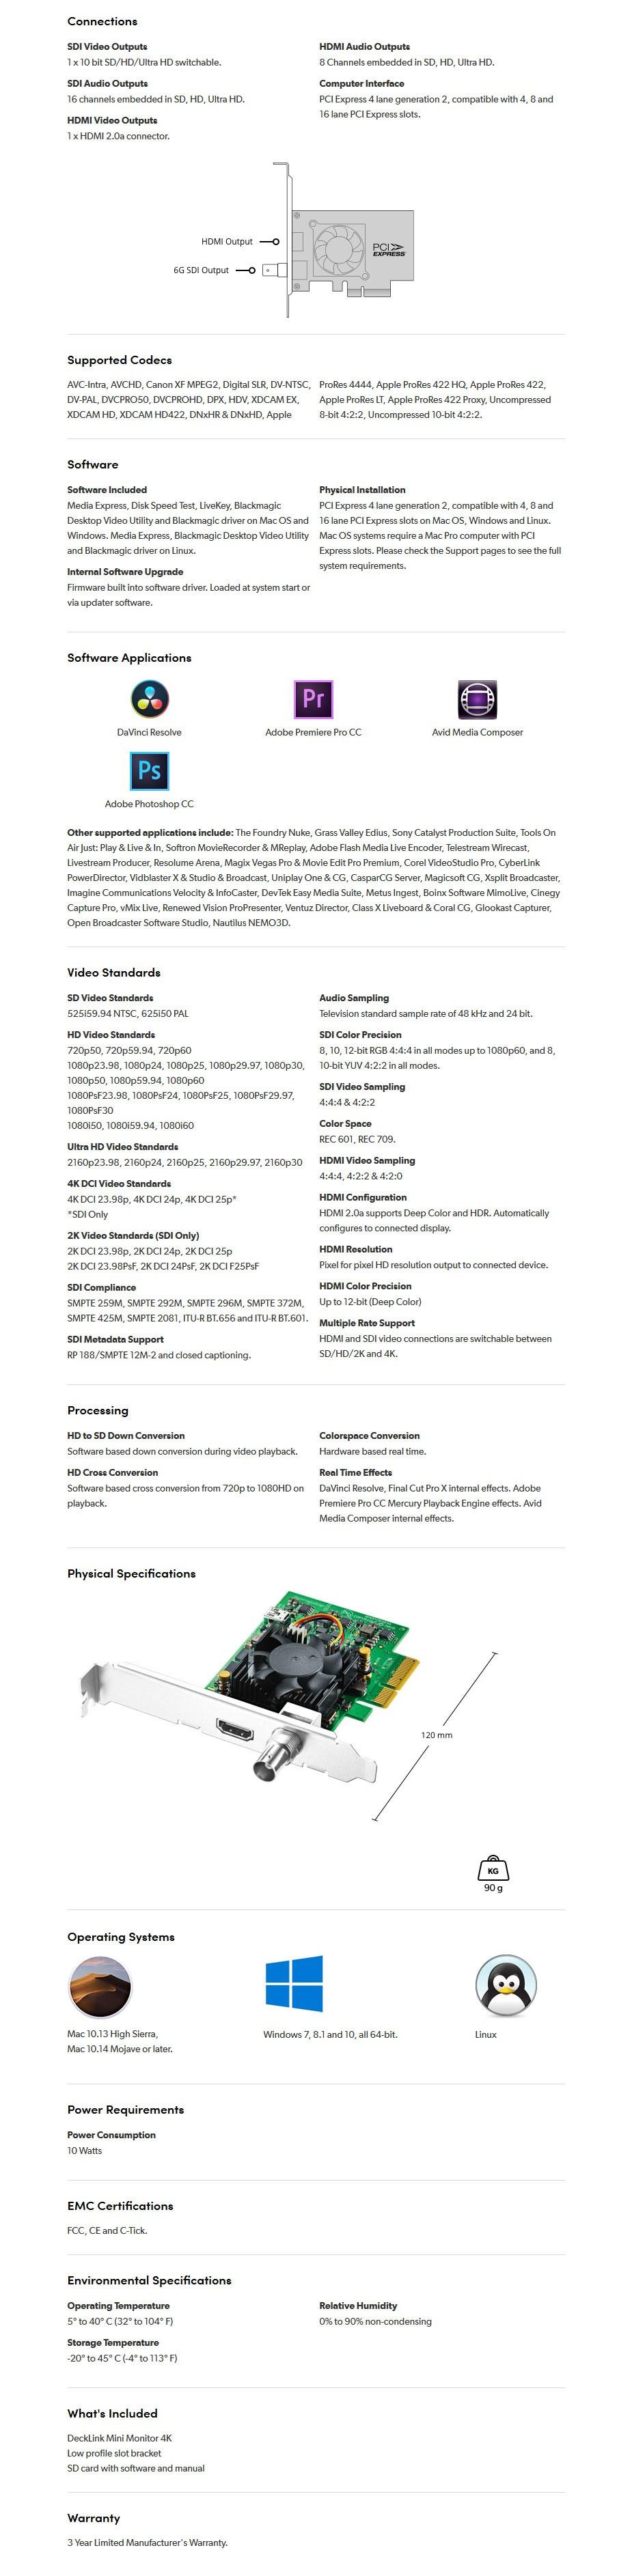 Blackmagic Design DeckLink 4K Mini Monitor - Overview 1